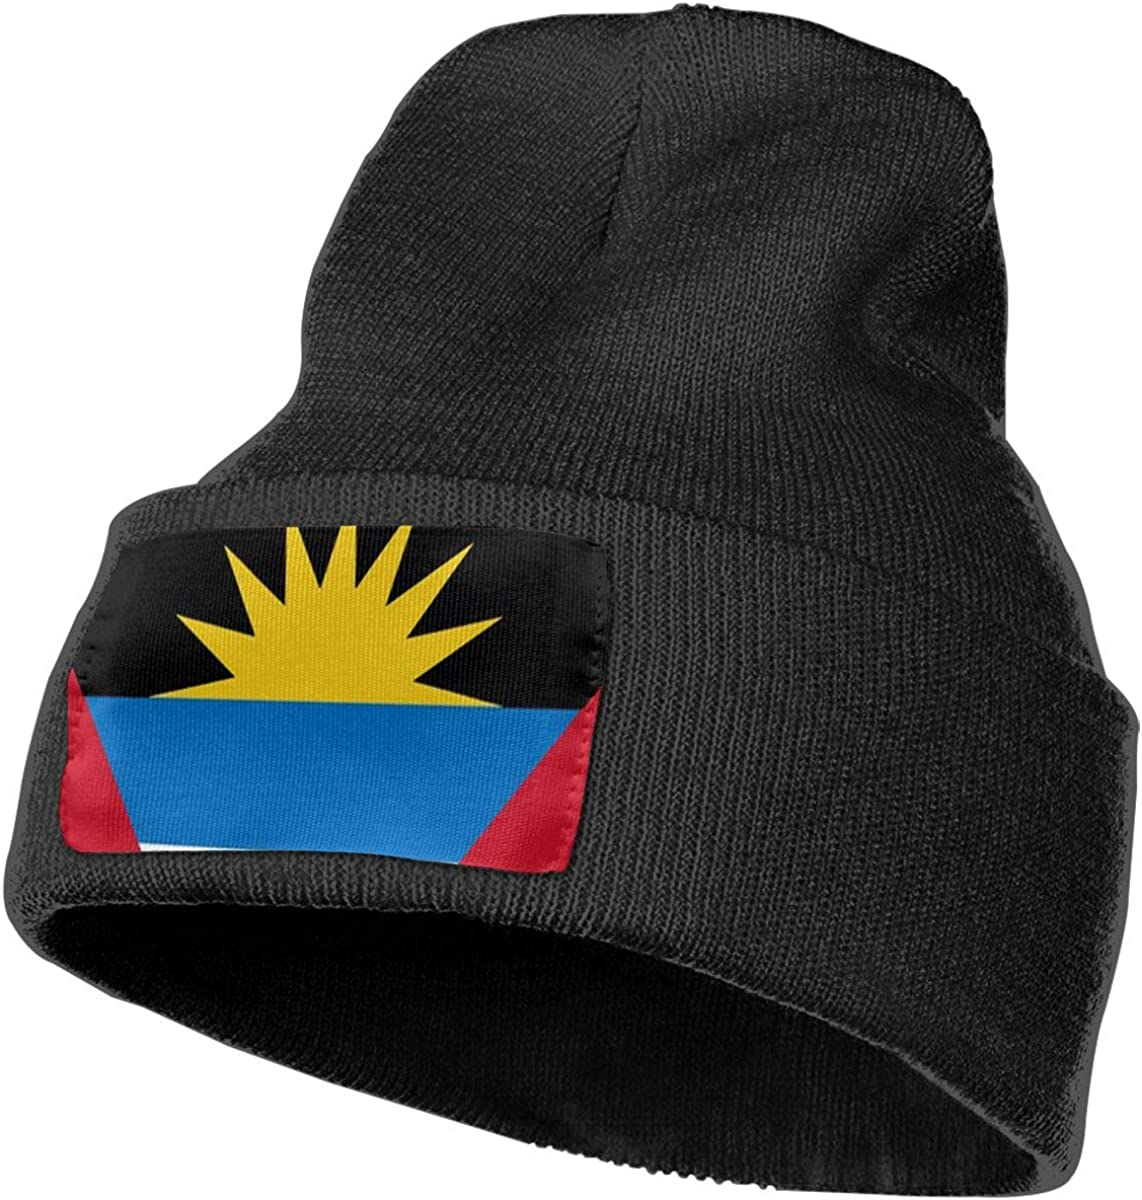 100/% Acrylic Acid Mas Beanie Hat Ruin Flag Fashion Knitting Hat for Men Women